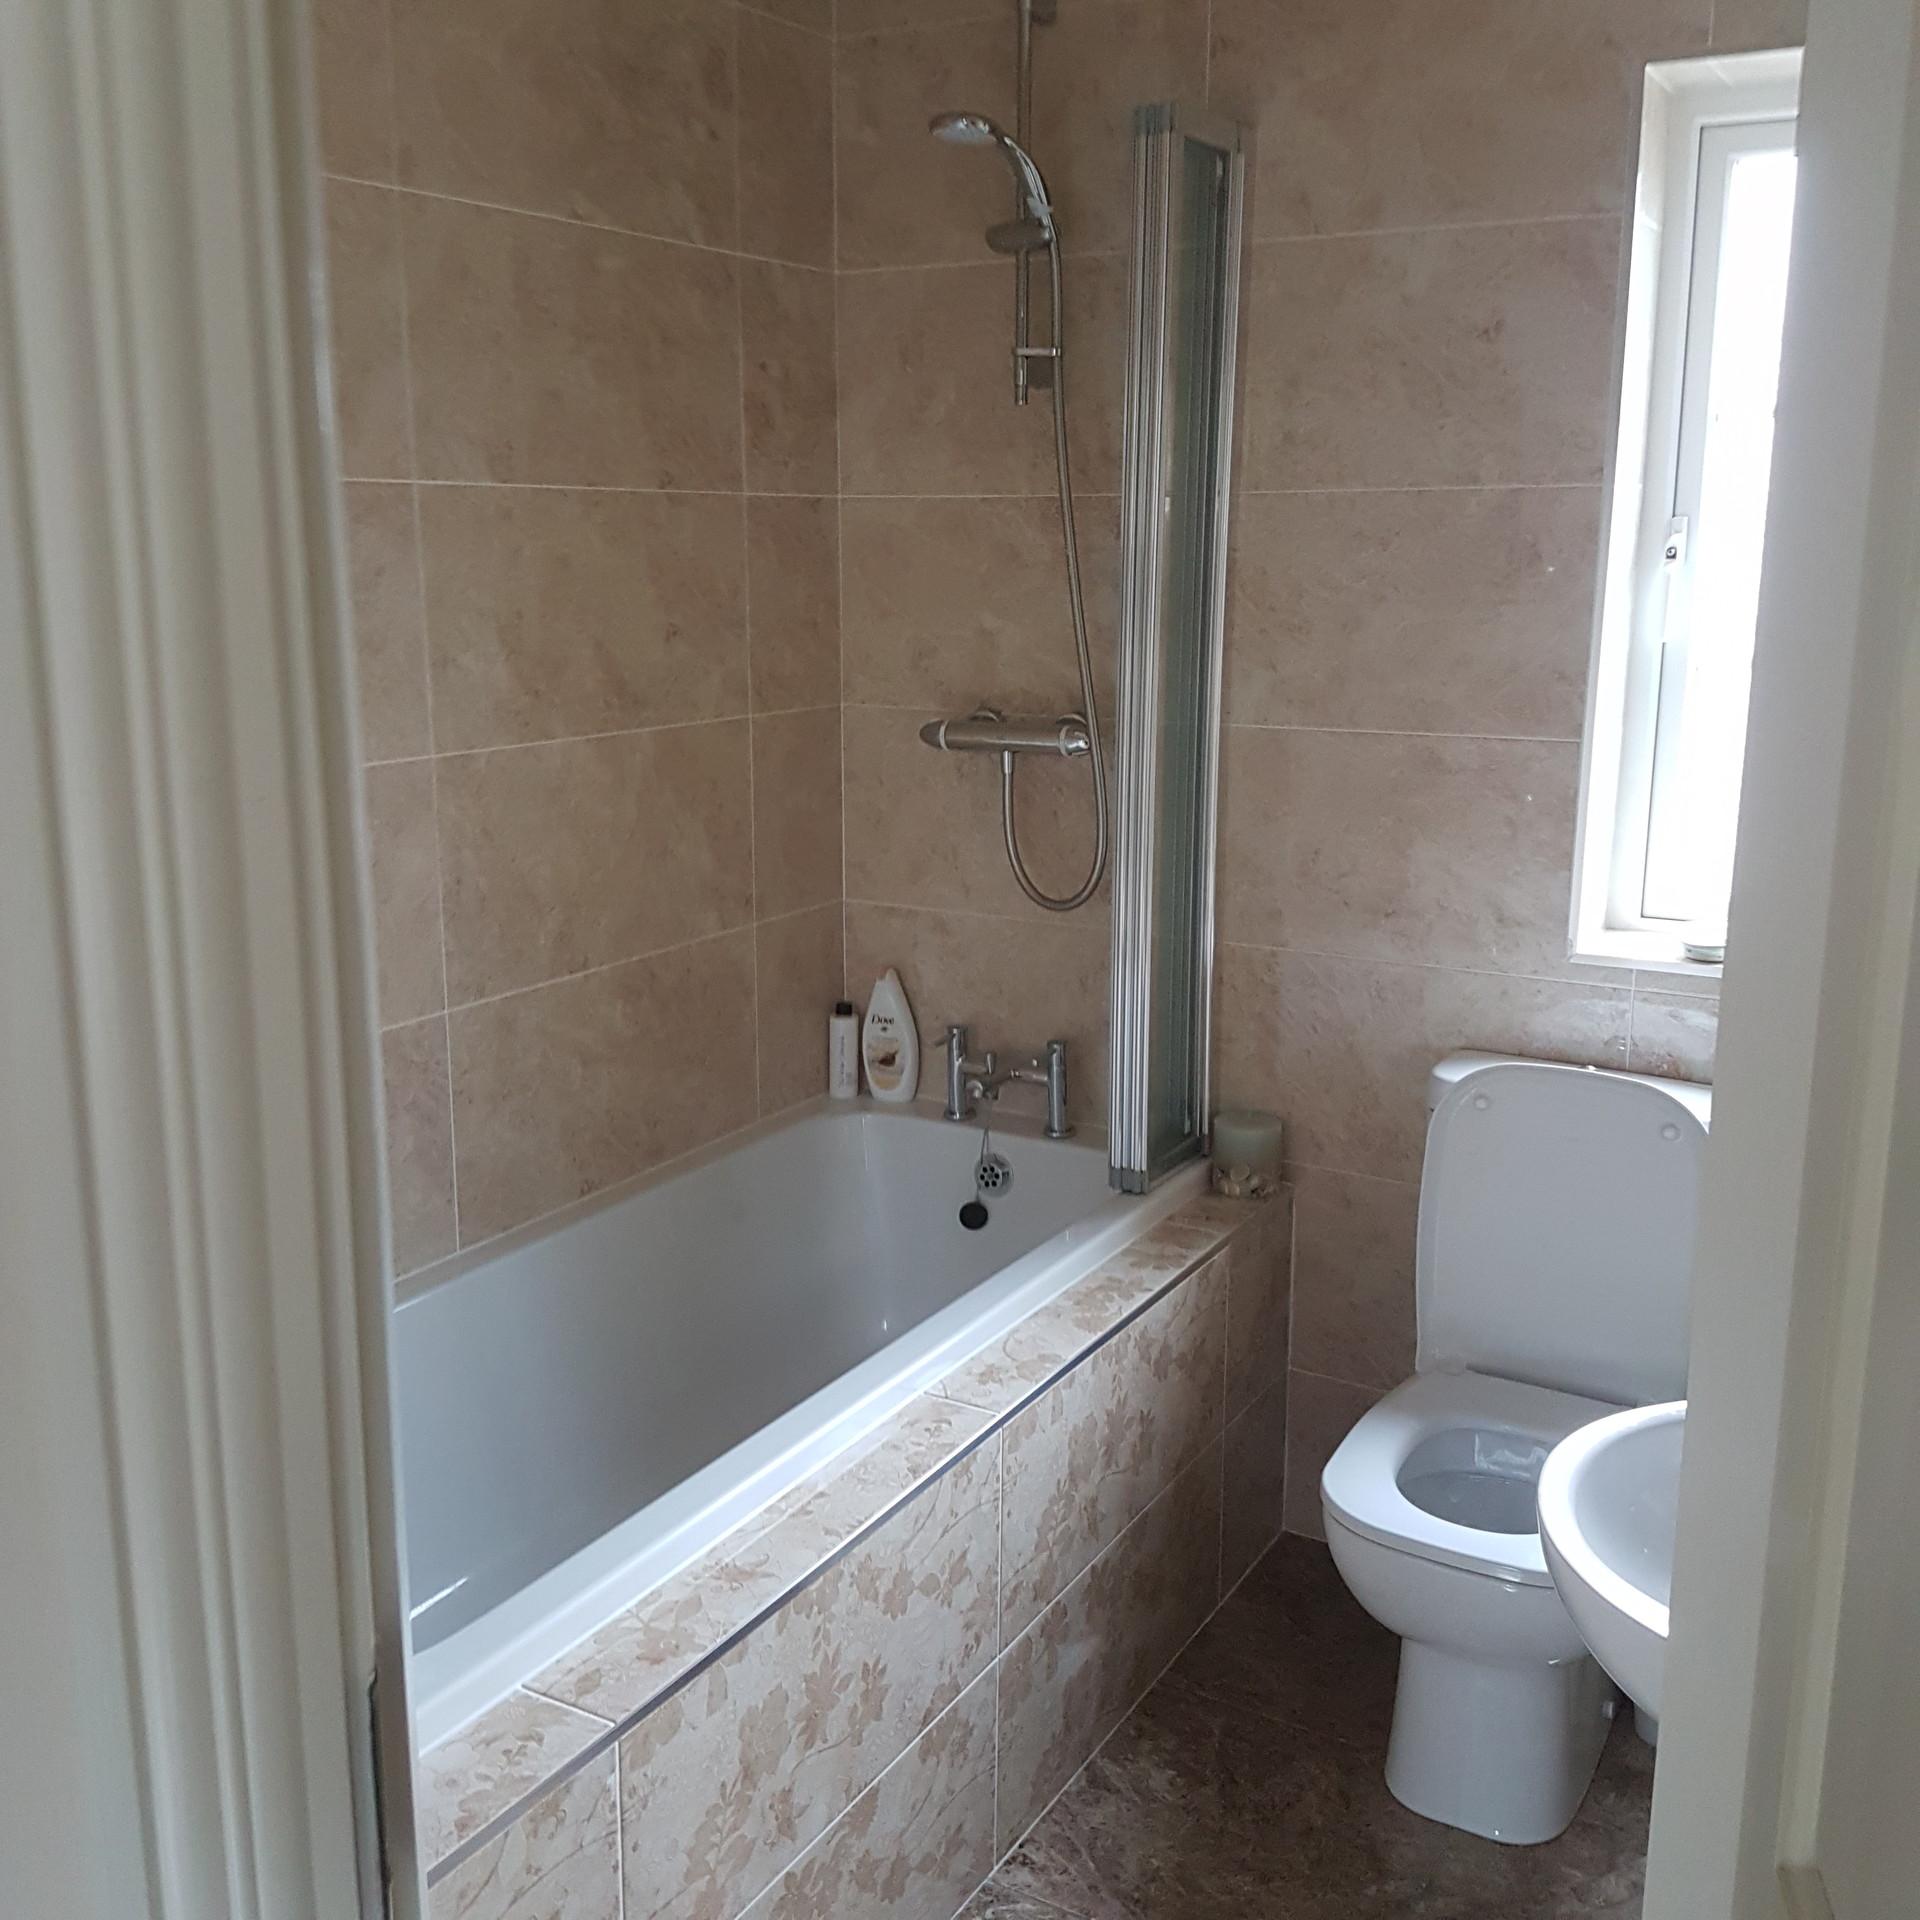 Bedroom With Ensuite Bathroom: Large Double Ensuite Bedroom To Rent In Barna, Galway